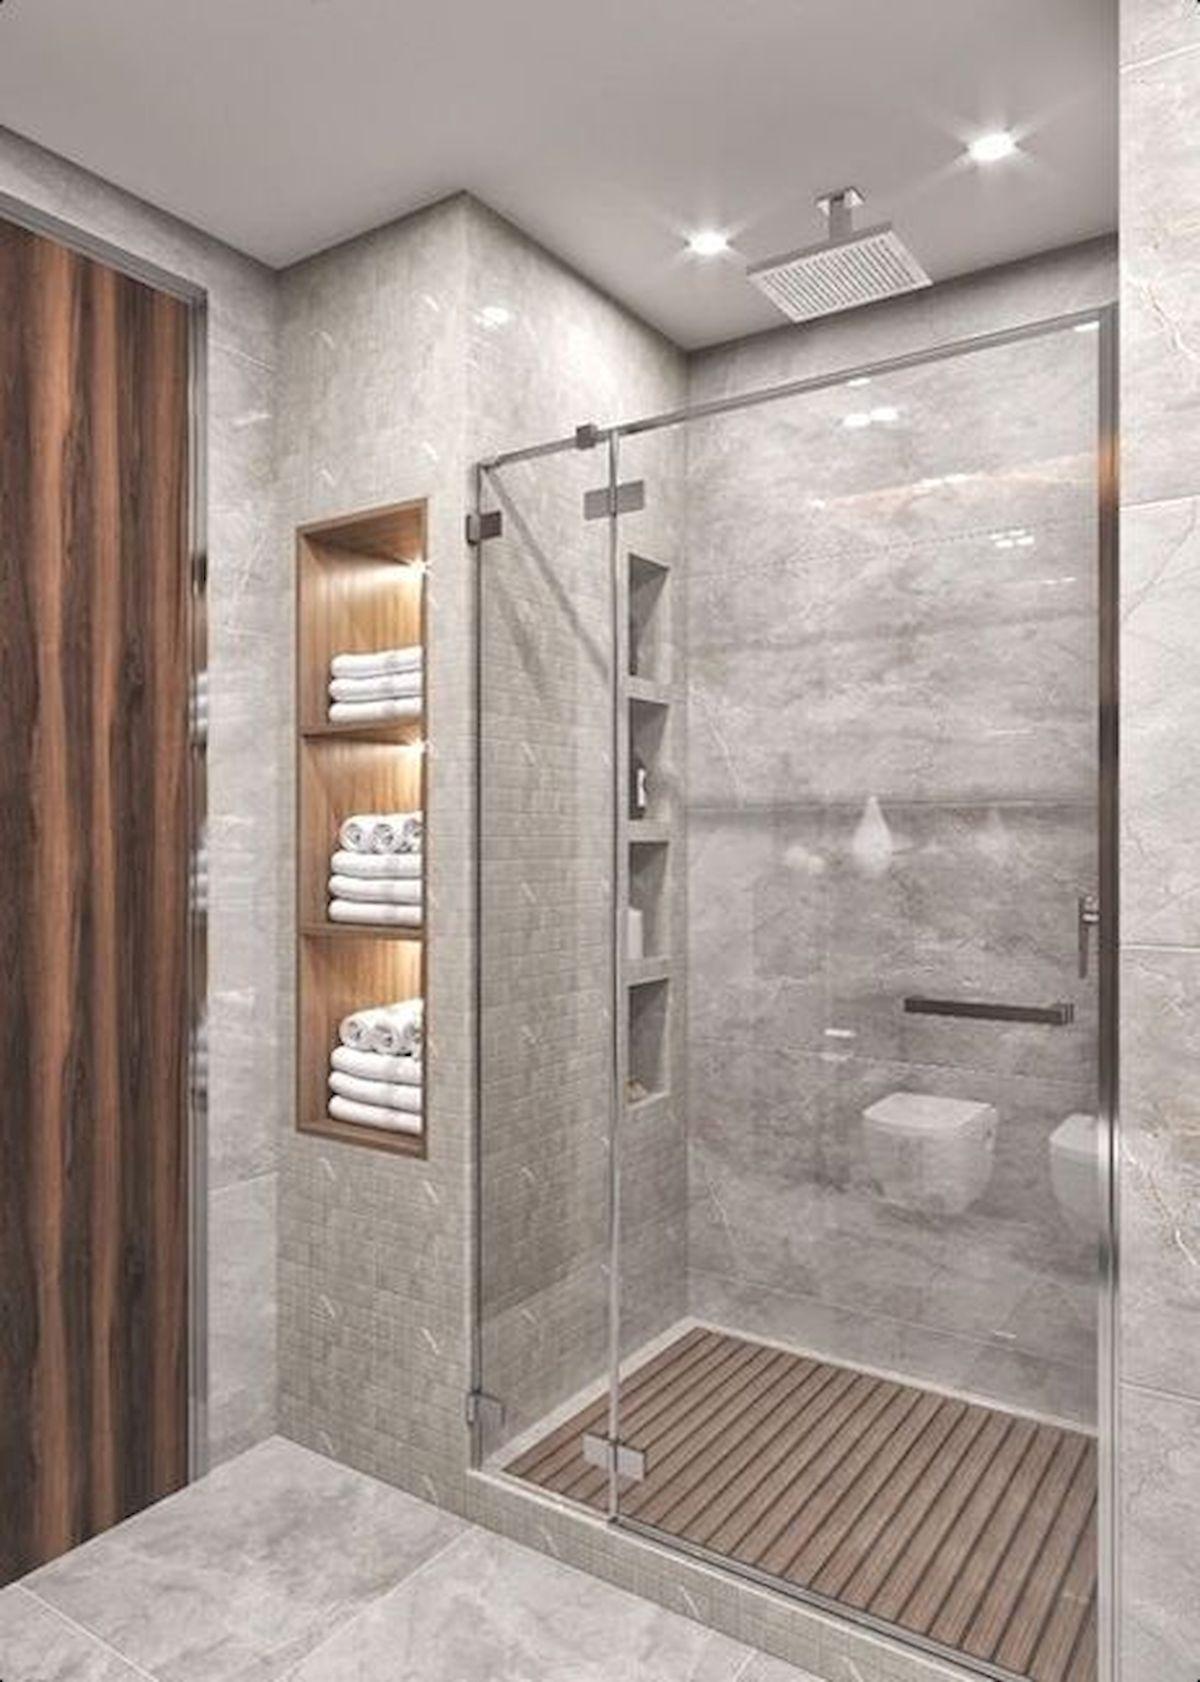 50 Stunning Small Bathroom Makeover Ideas - CoachDecor.com ... on Small Restroom Ideas  id=81989